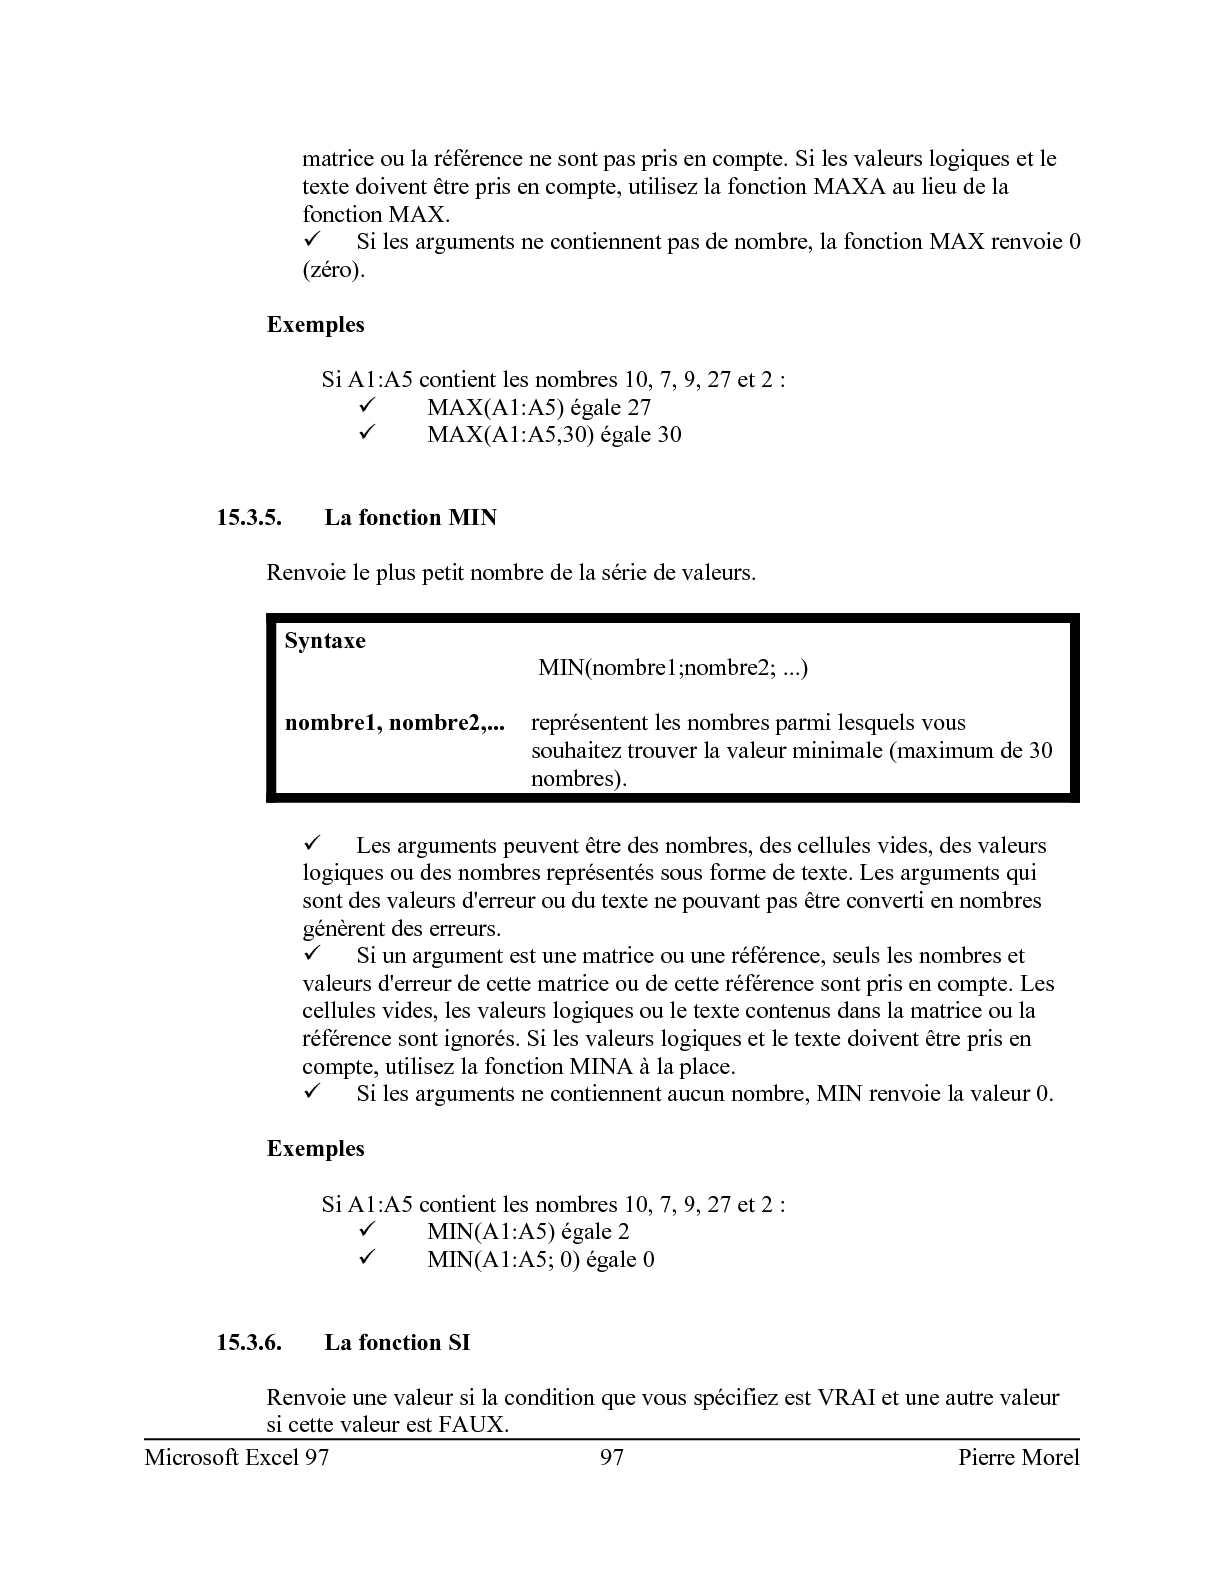 Microsoft Excel Par Pierre Morel - CALAMEO Downloader